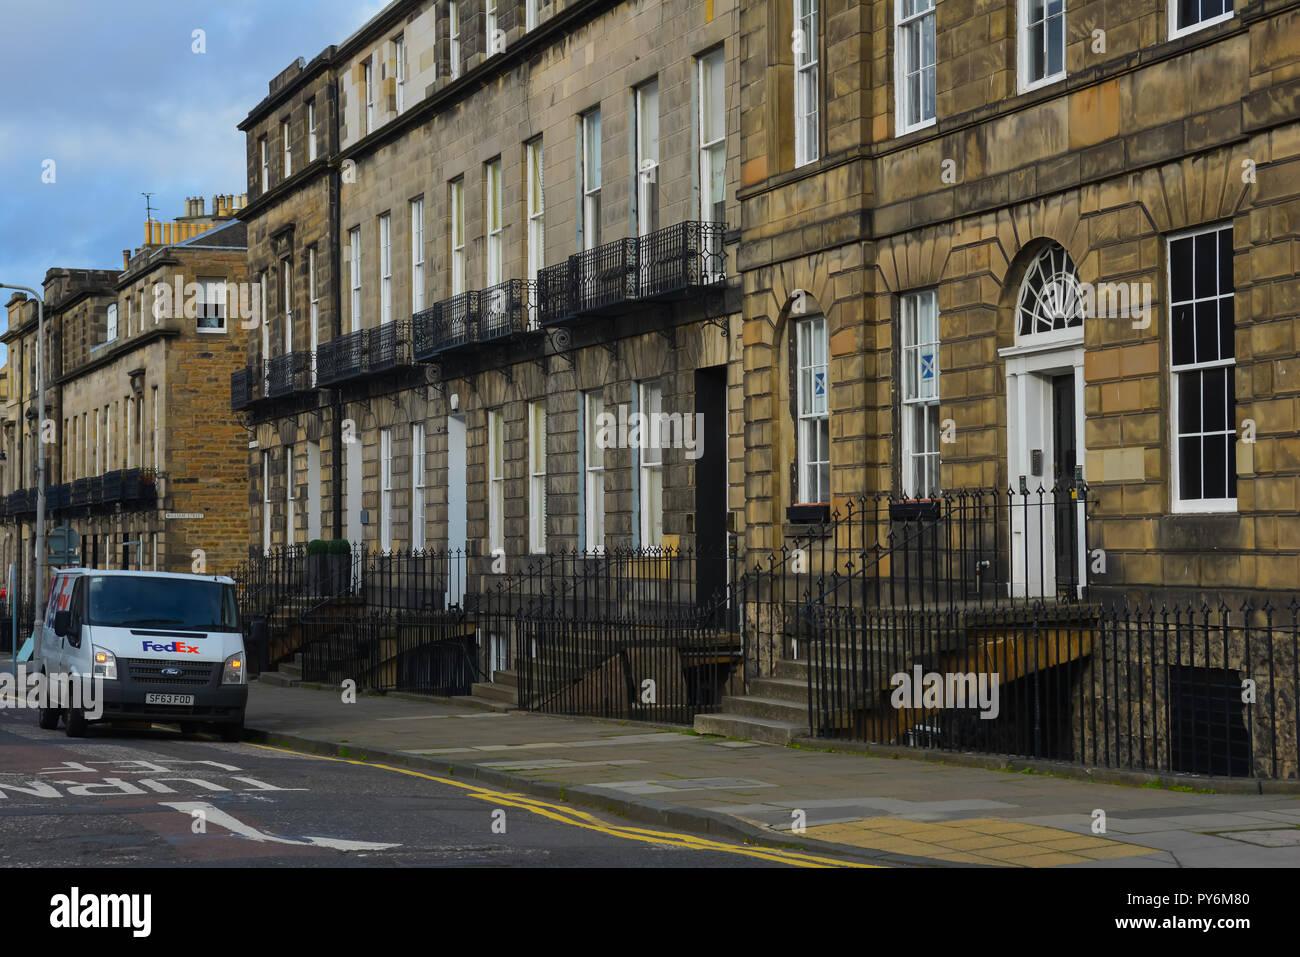 The city of Edinburgh - Stock Image